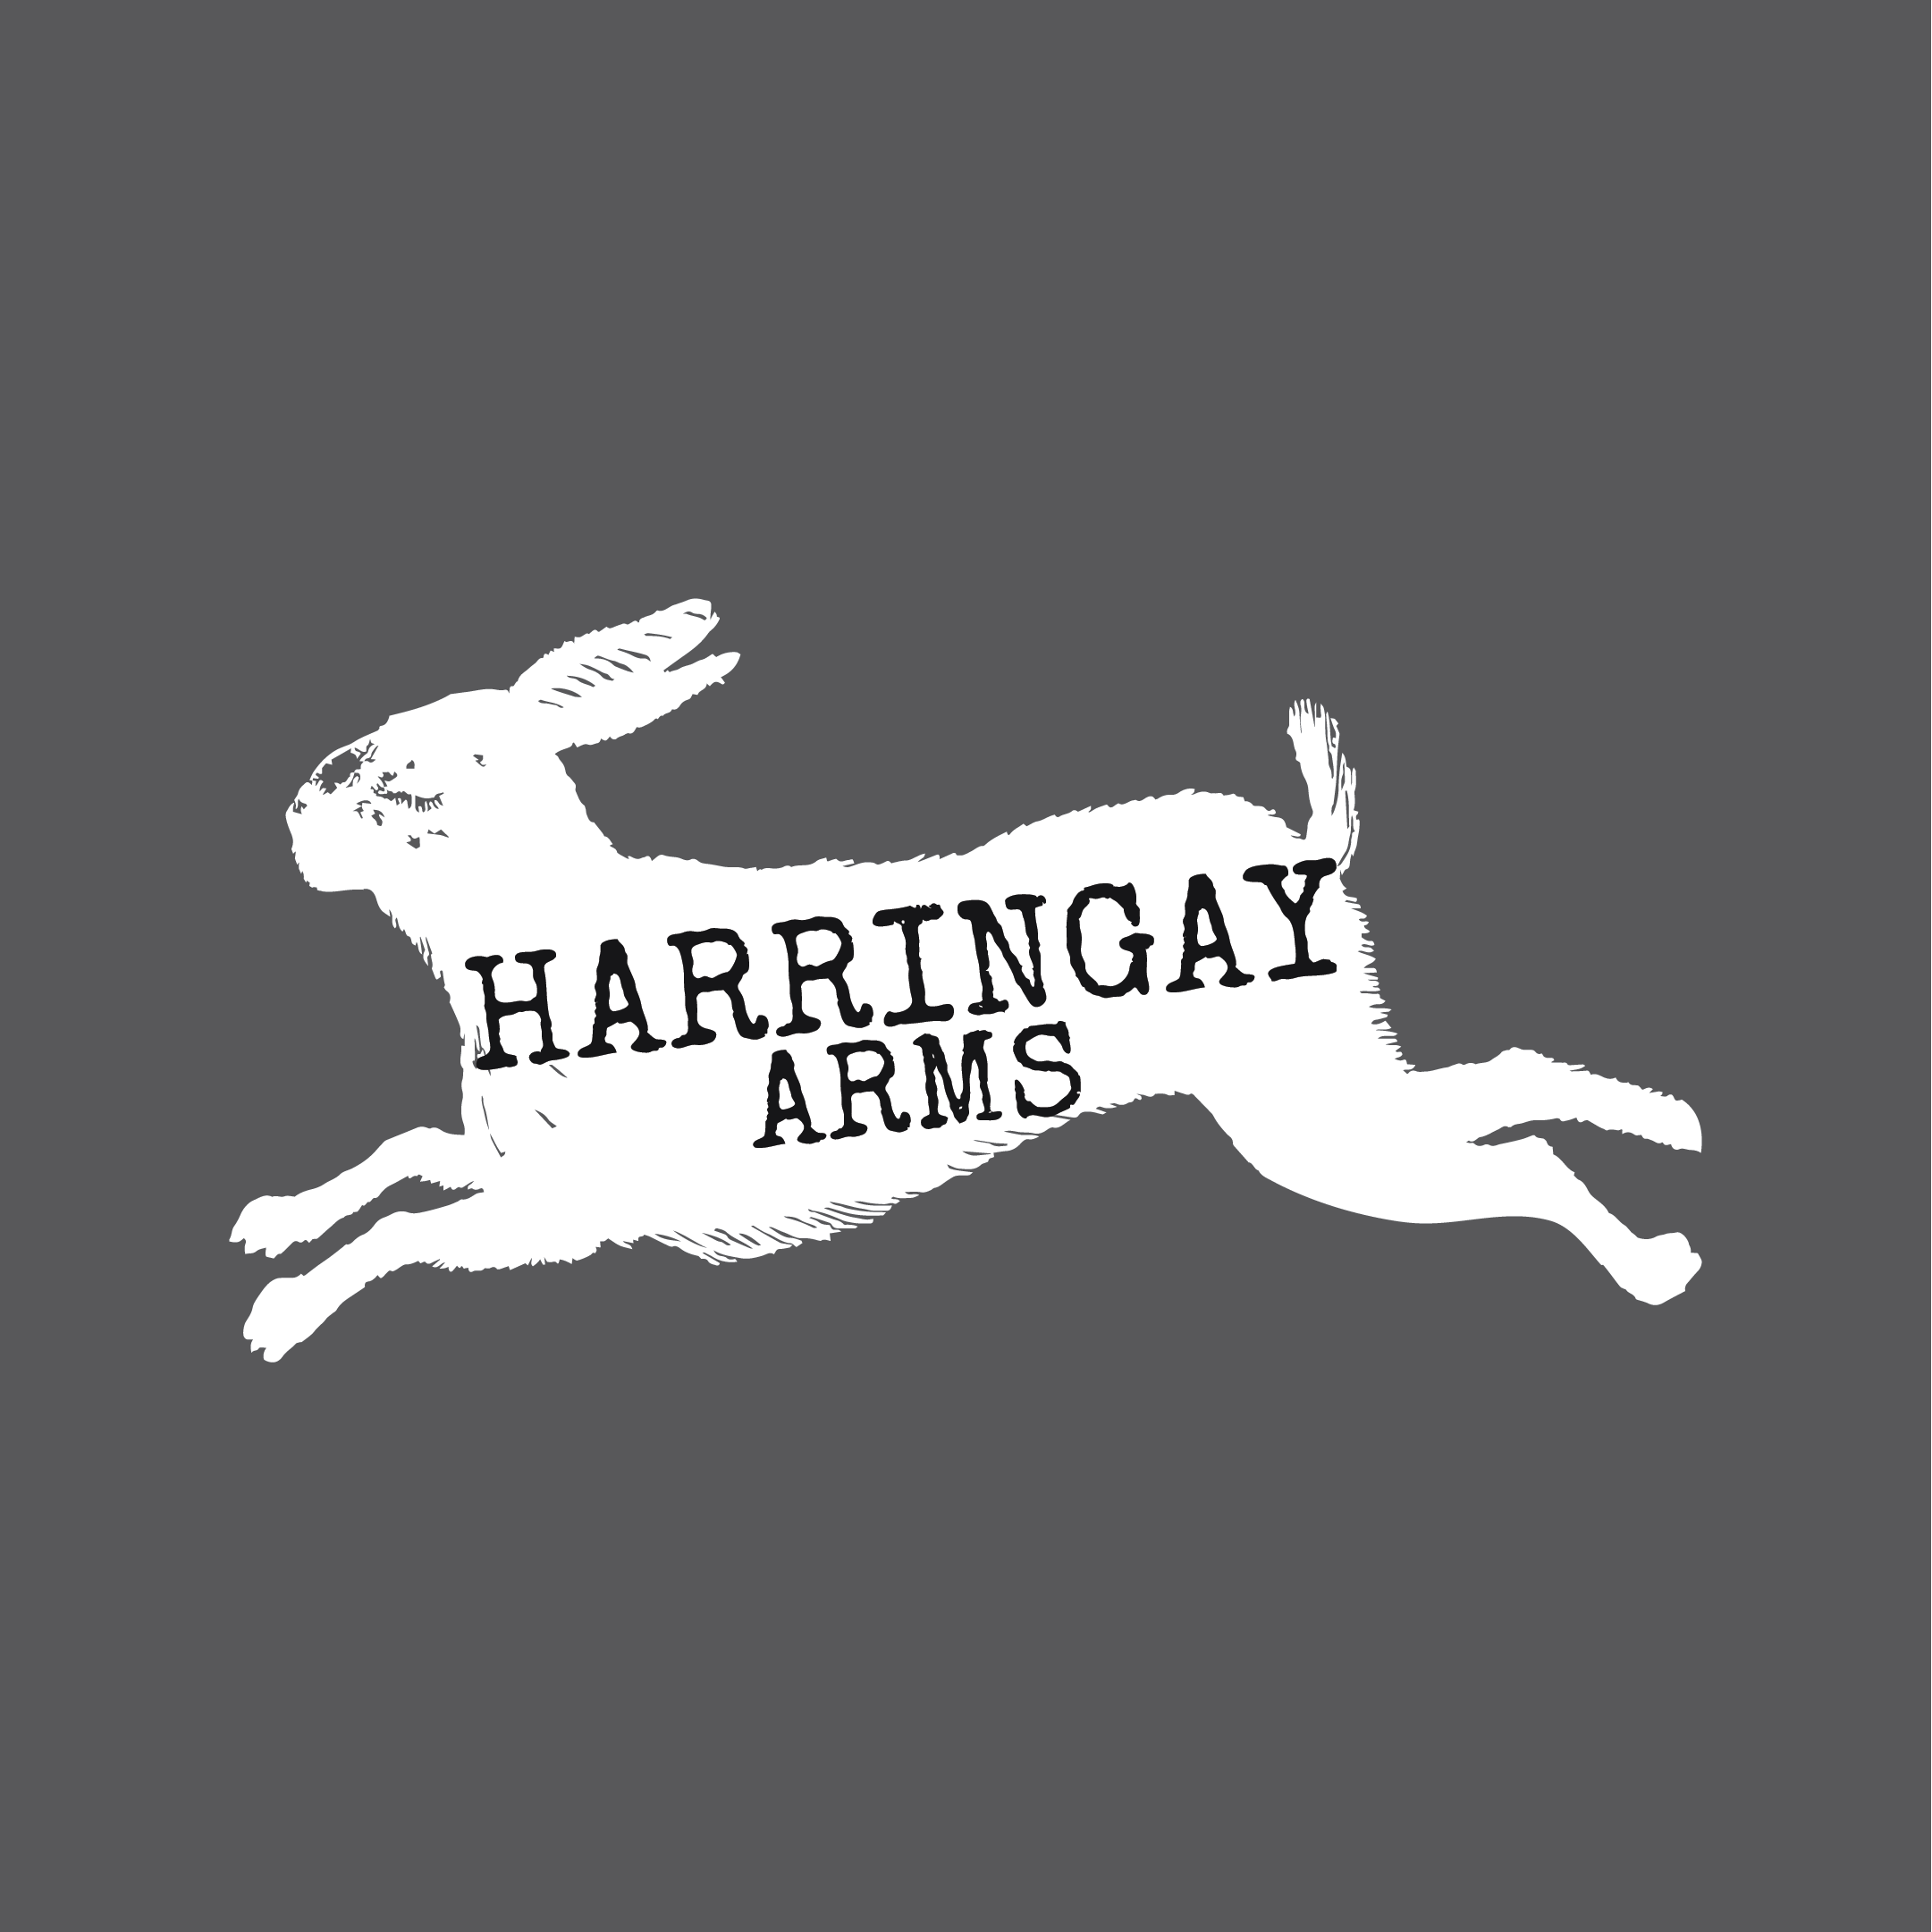 The Harringay Arms